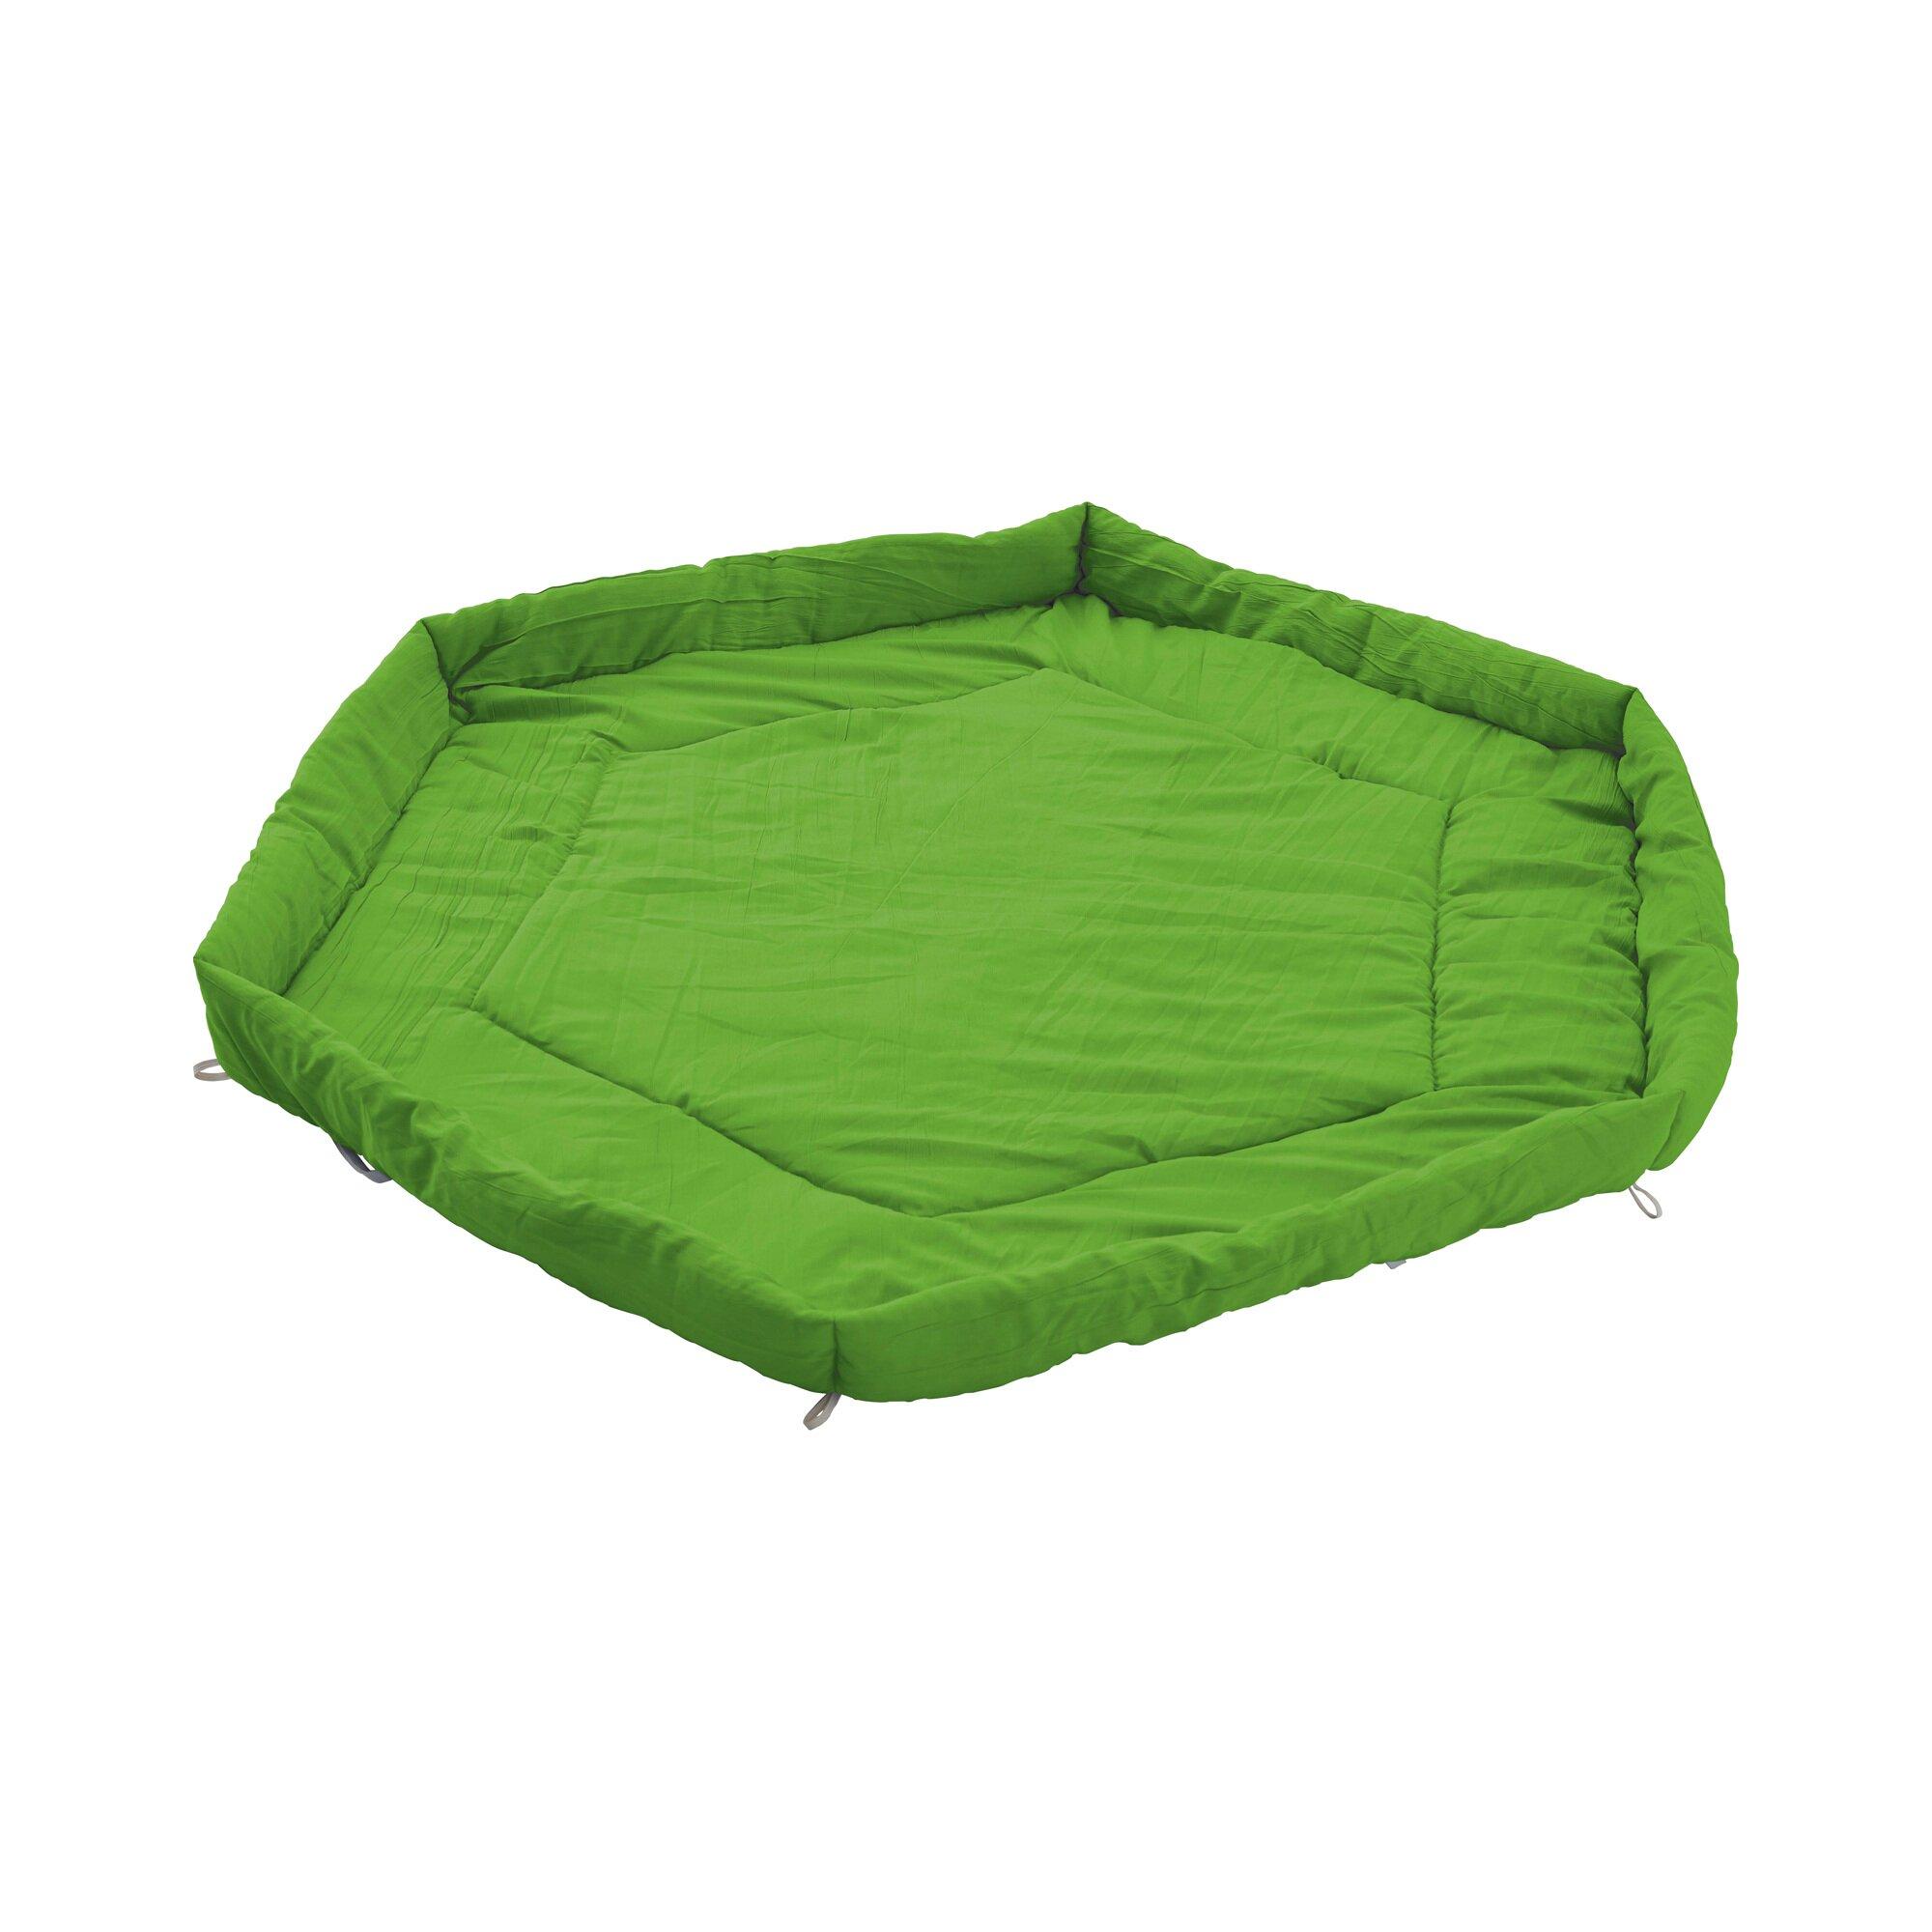 Einl.Konf.gitter FlexClas grün